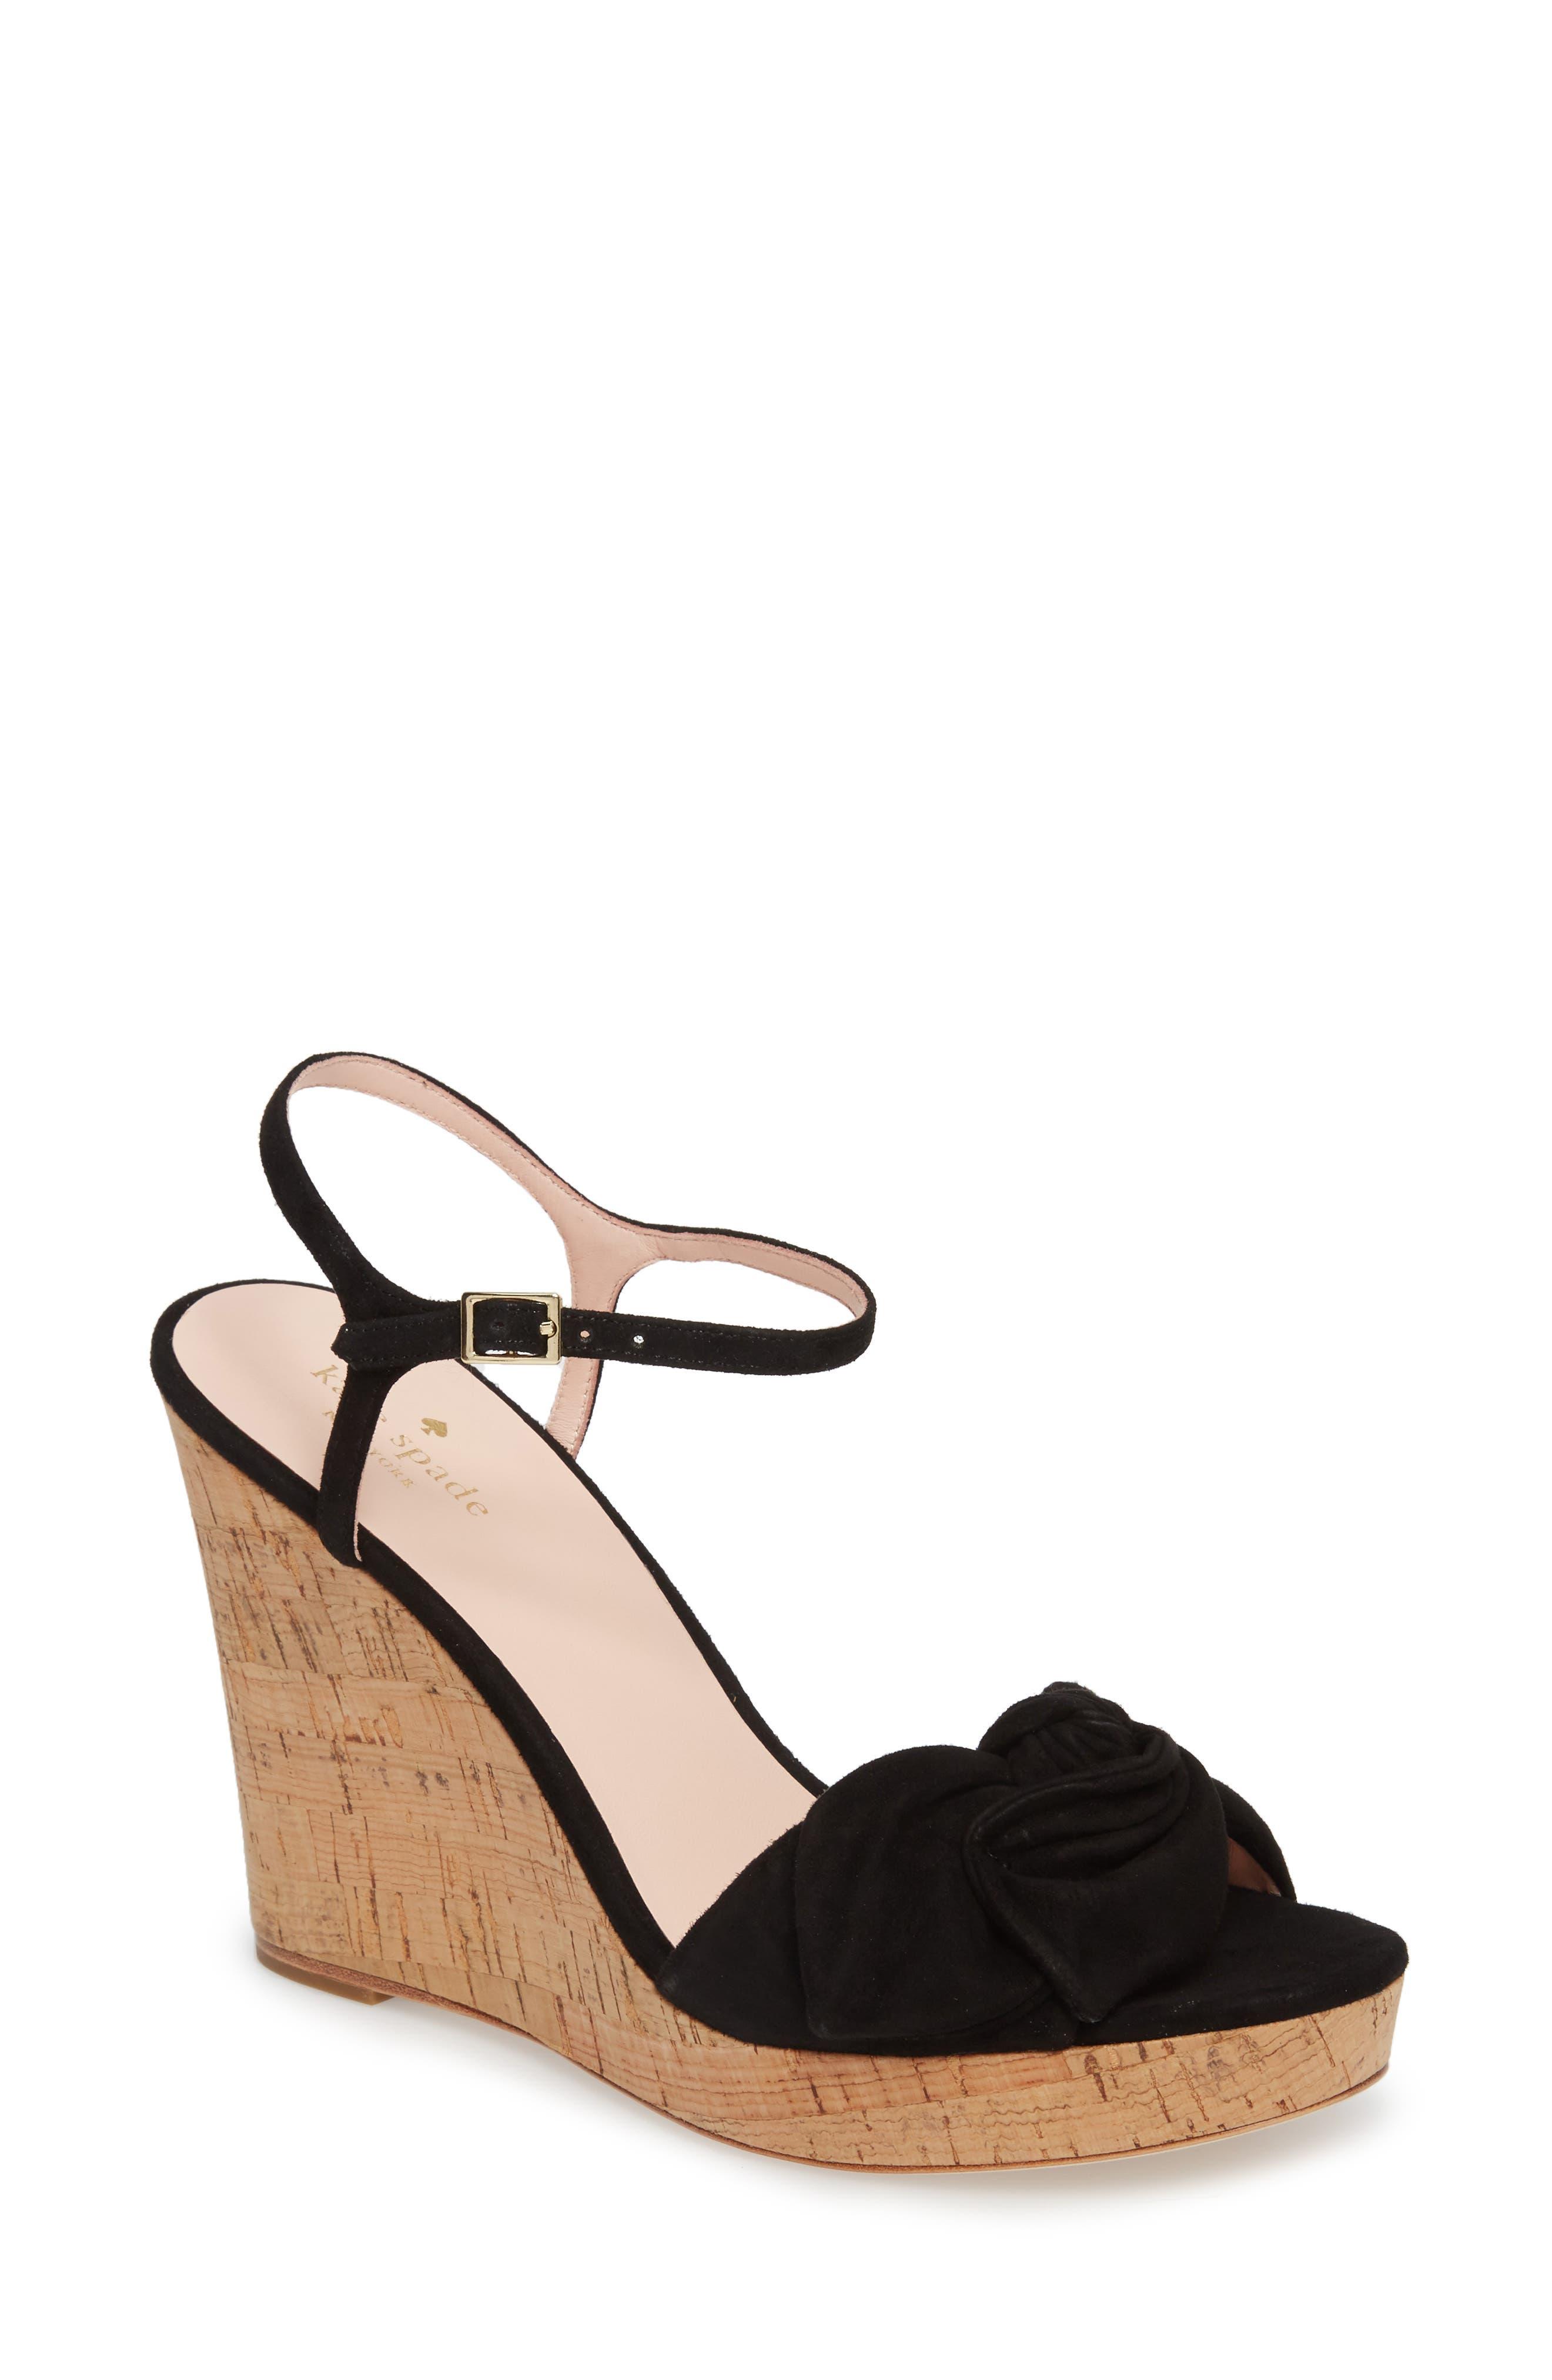 janae knot platform wedge sandal,                             Main thumbnail 1, color,                             001